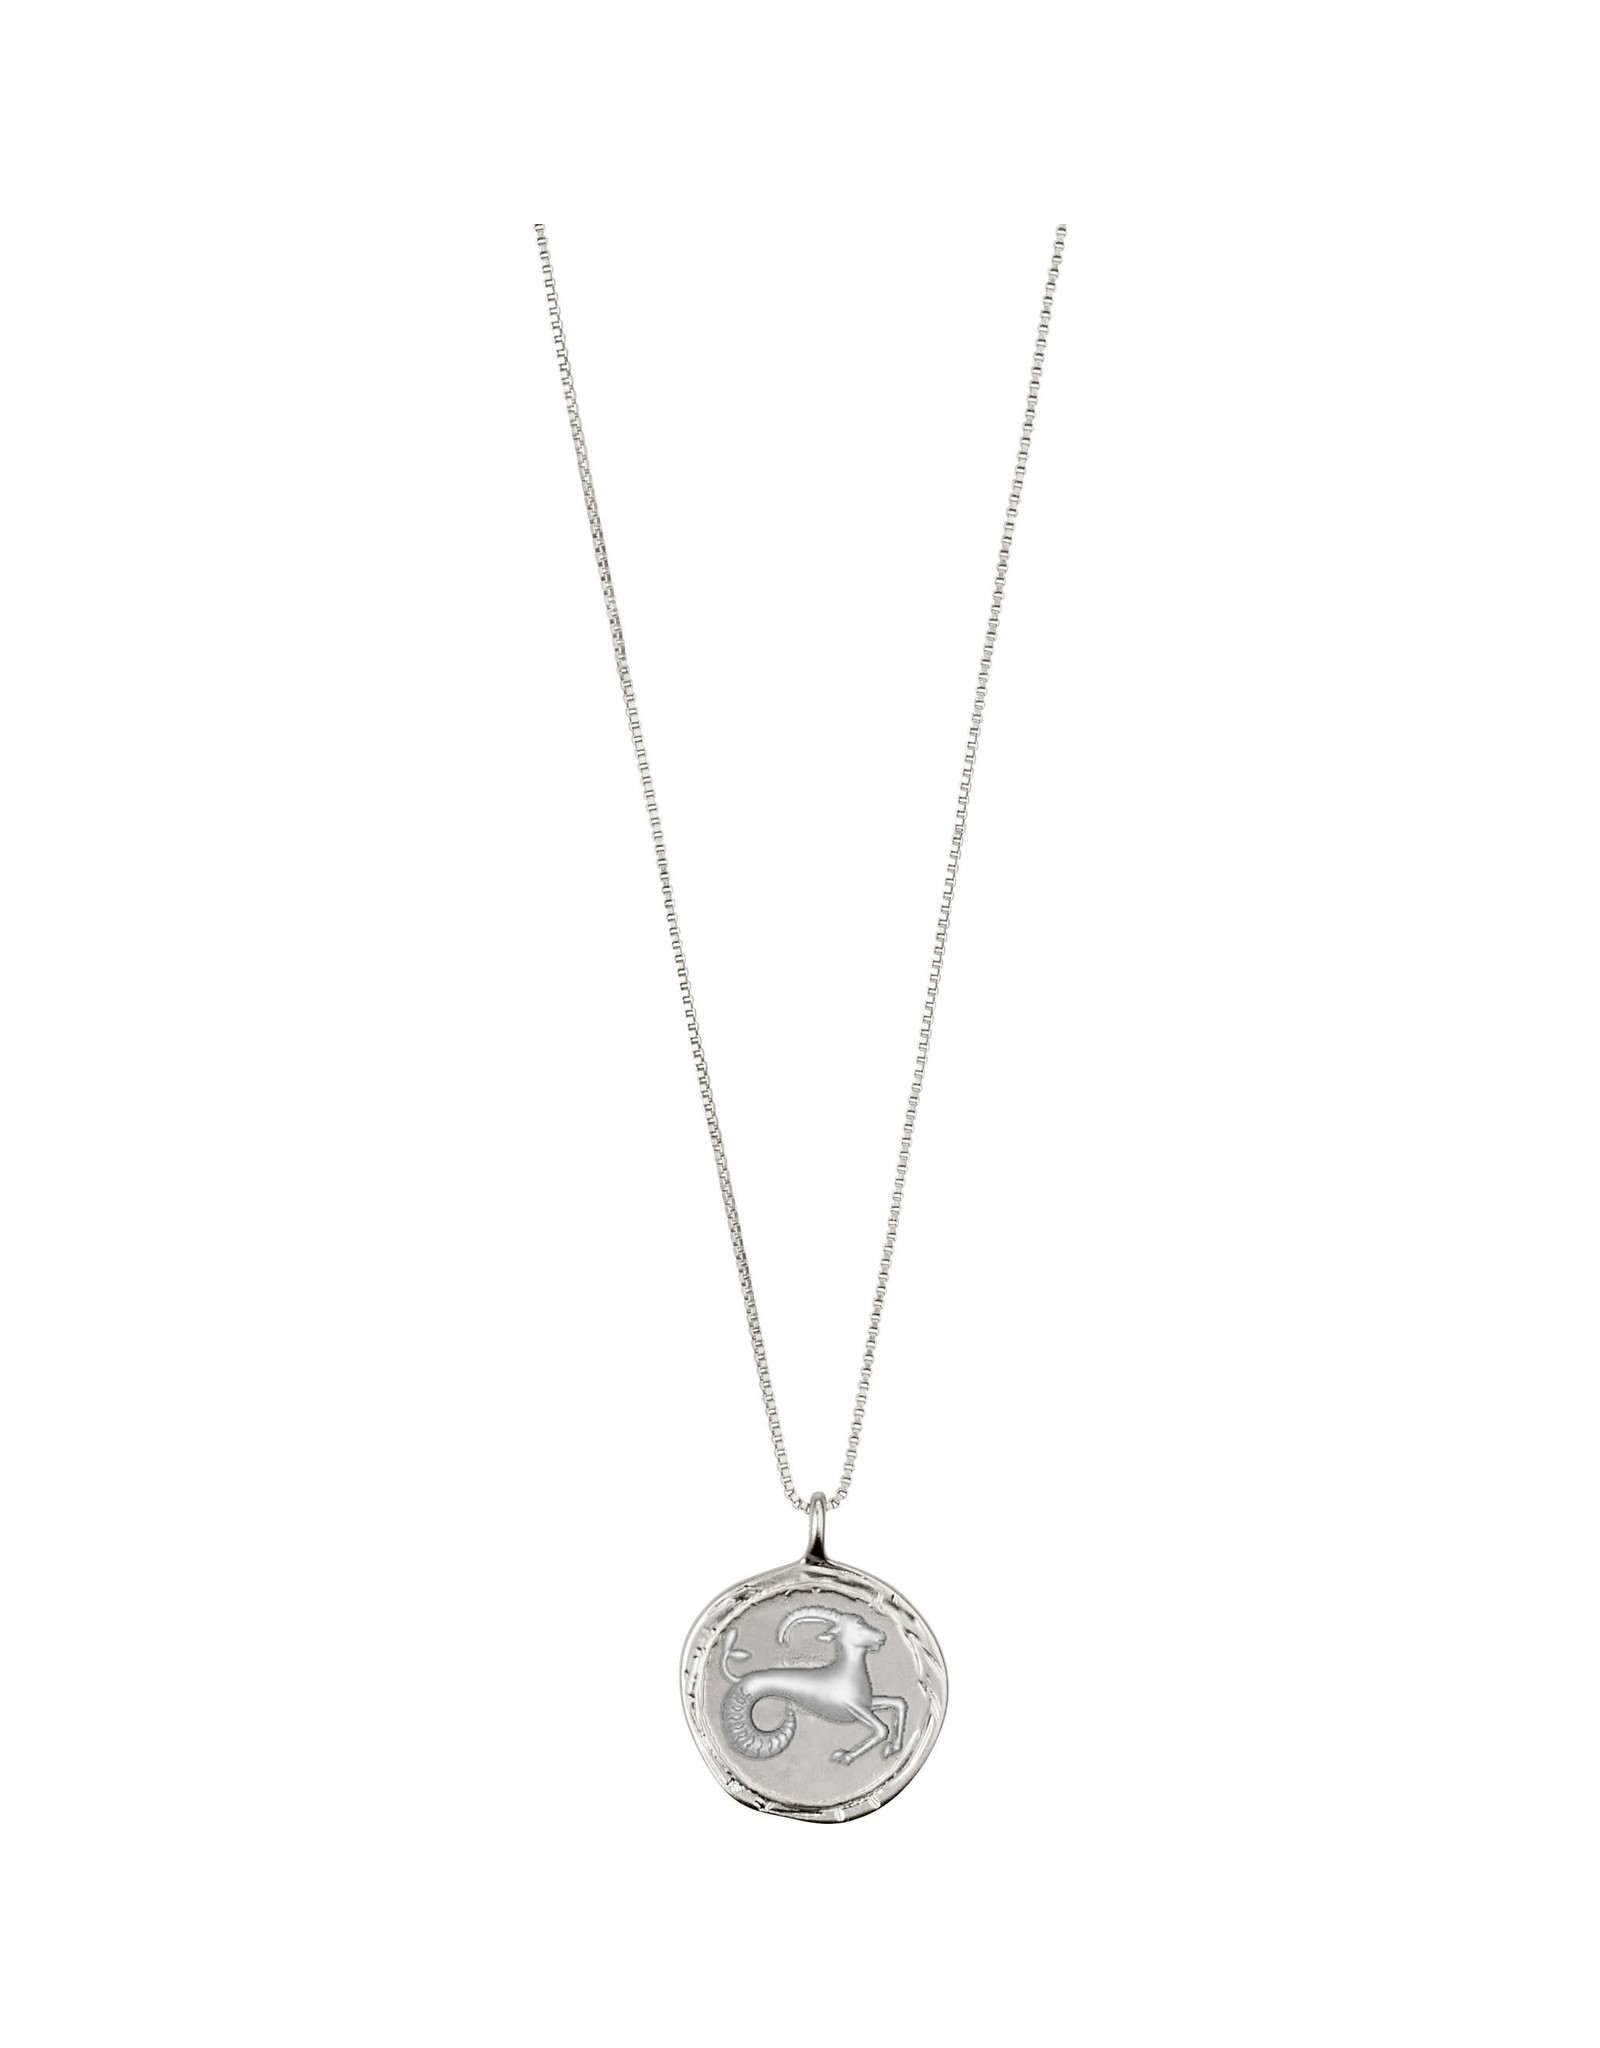 Pilgrim Necklace Capricorn Zodiac Sign, Crystal, Silver